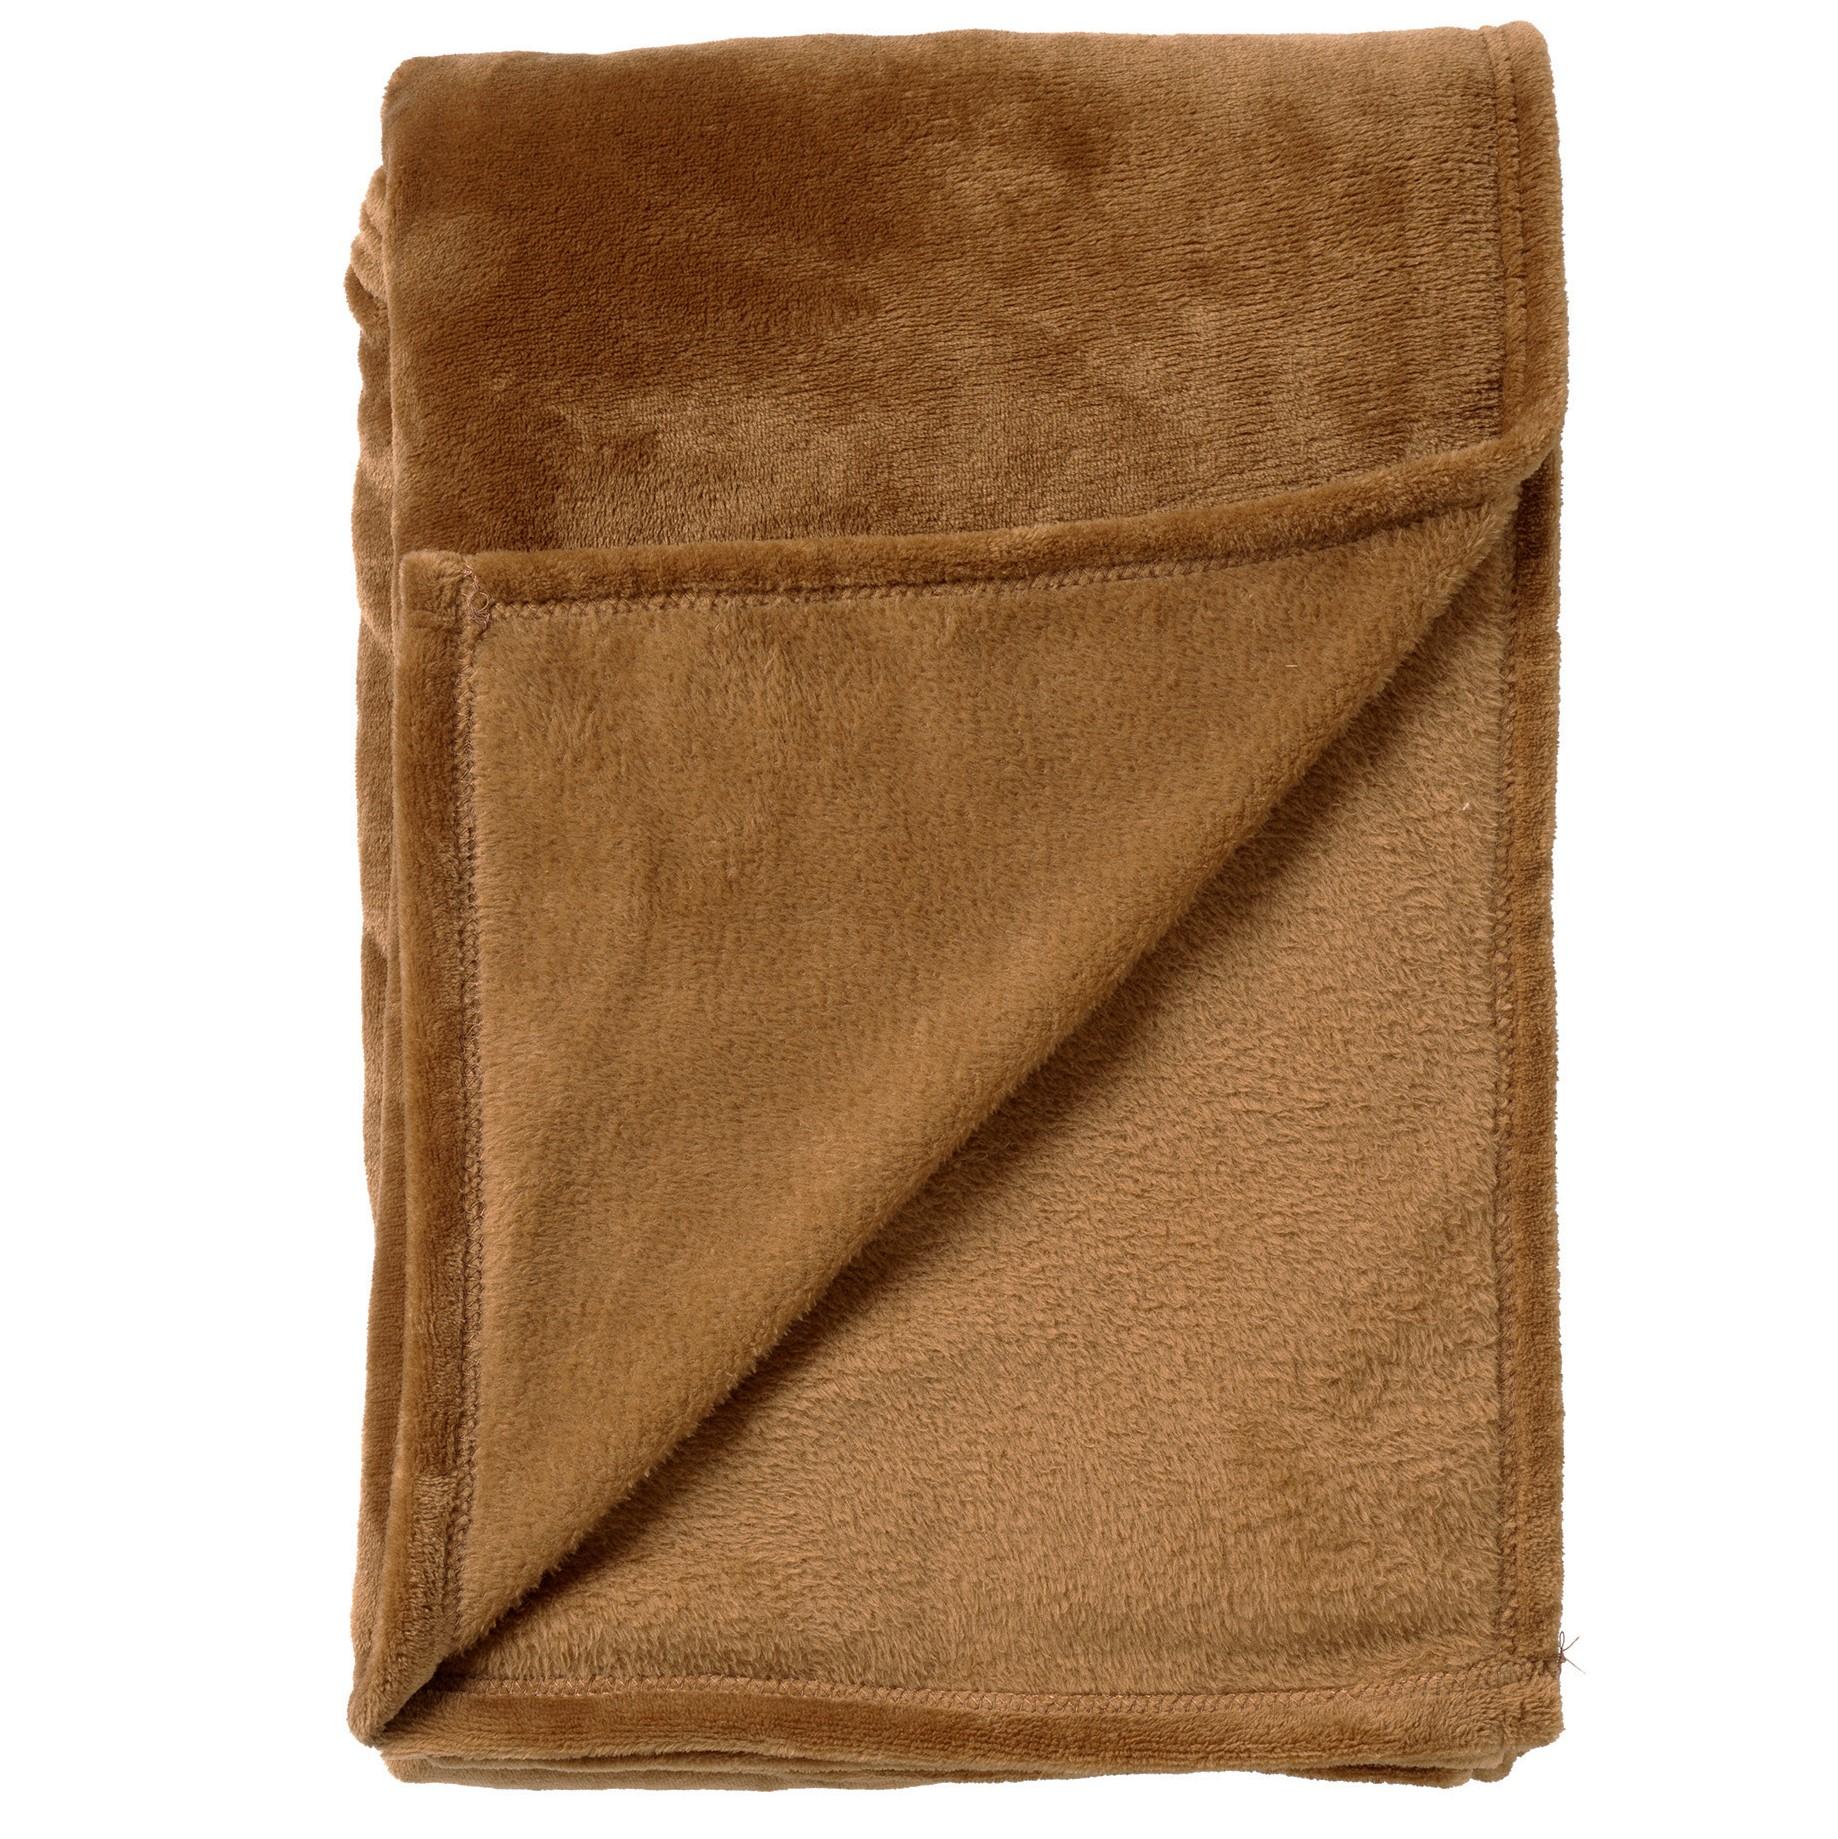 BILLY - Plaid Tobacco Brown 150x200 cm